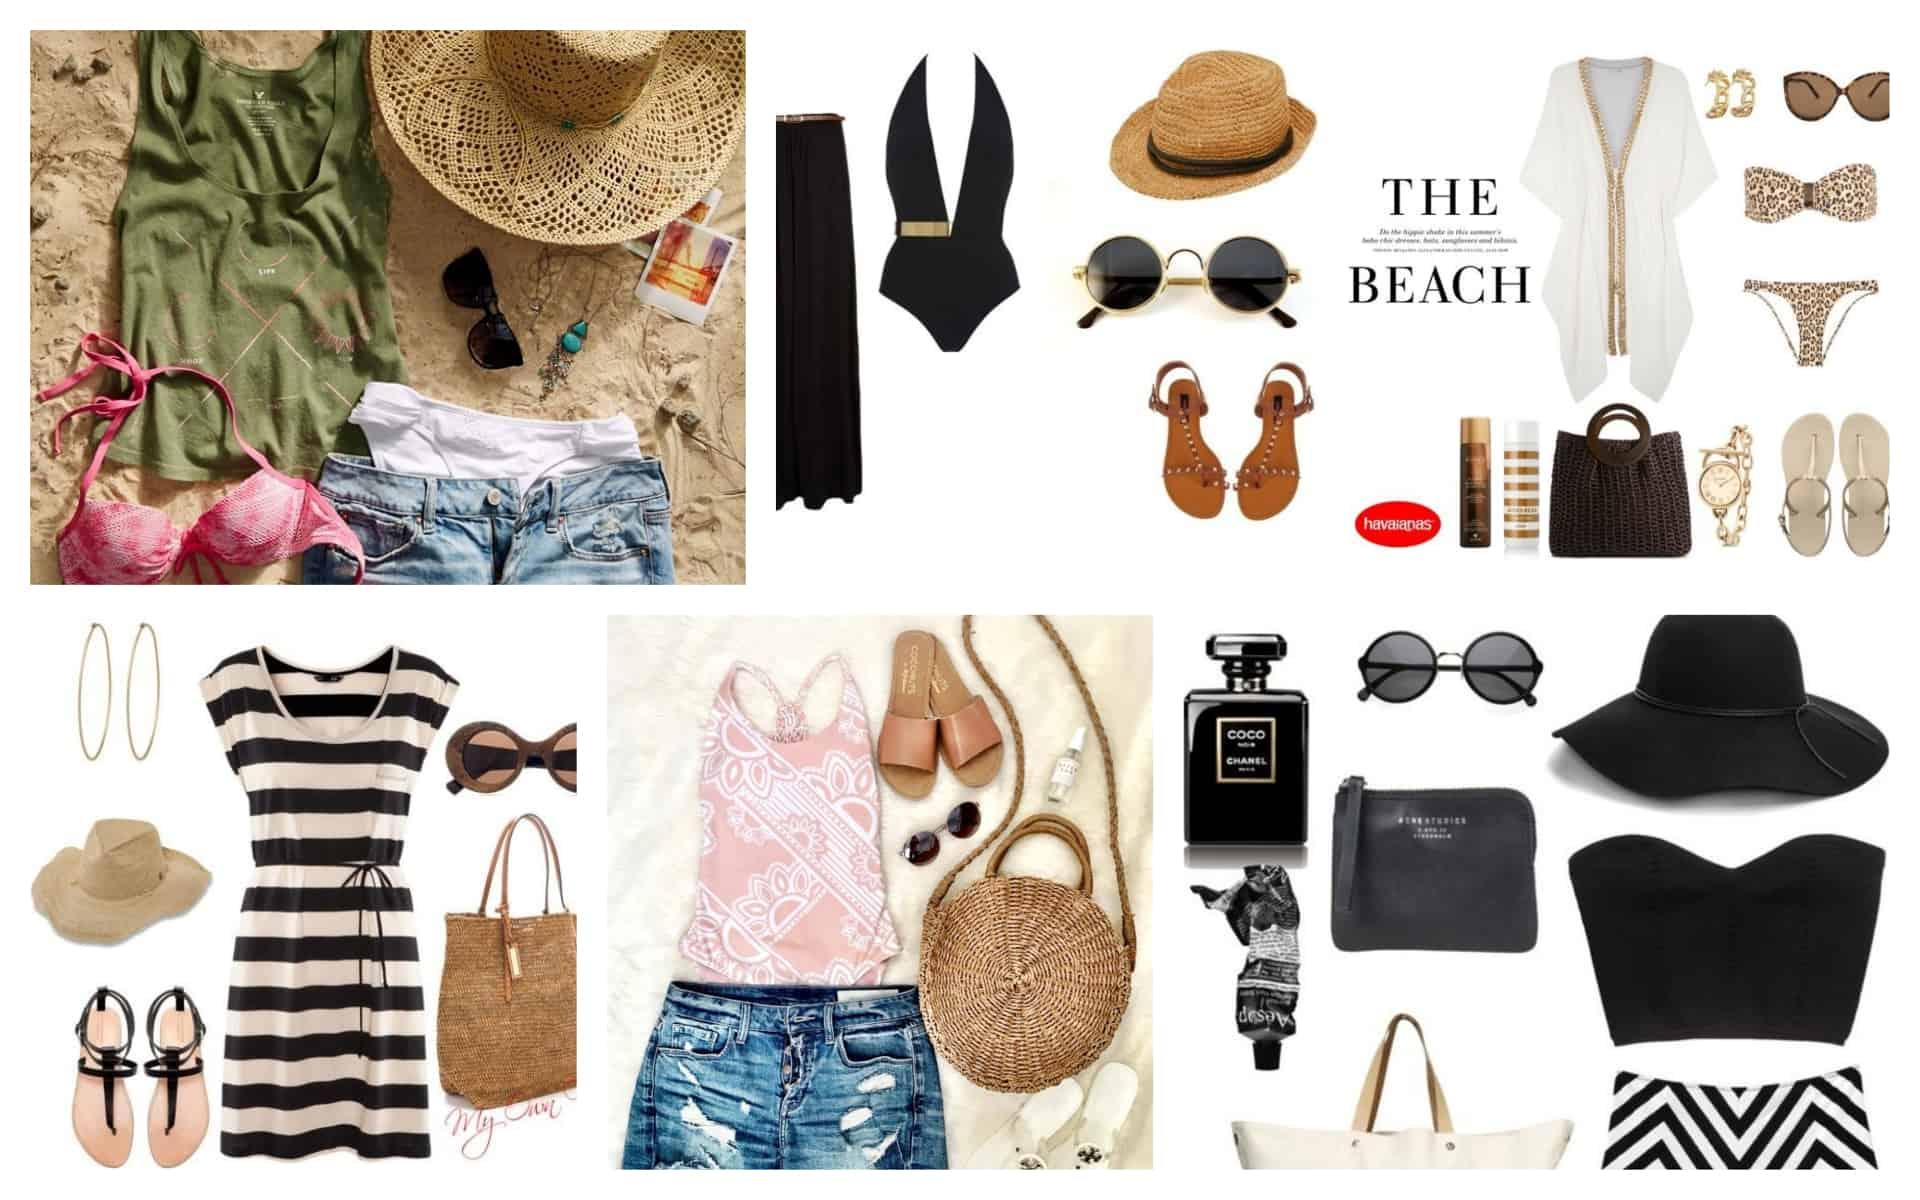 Beach cute outfits polyvore catalog photo